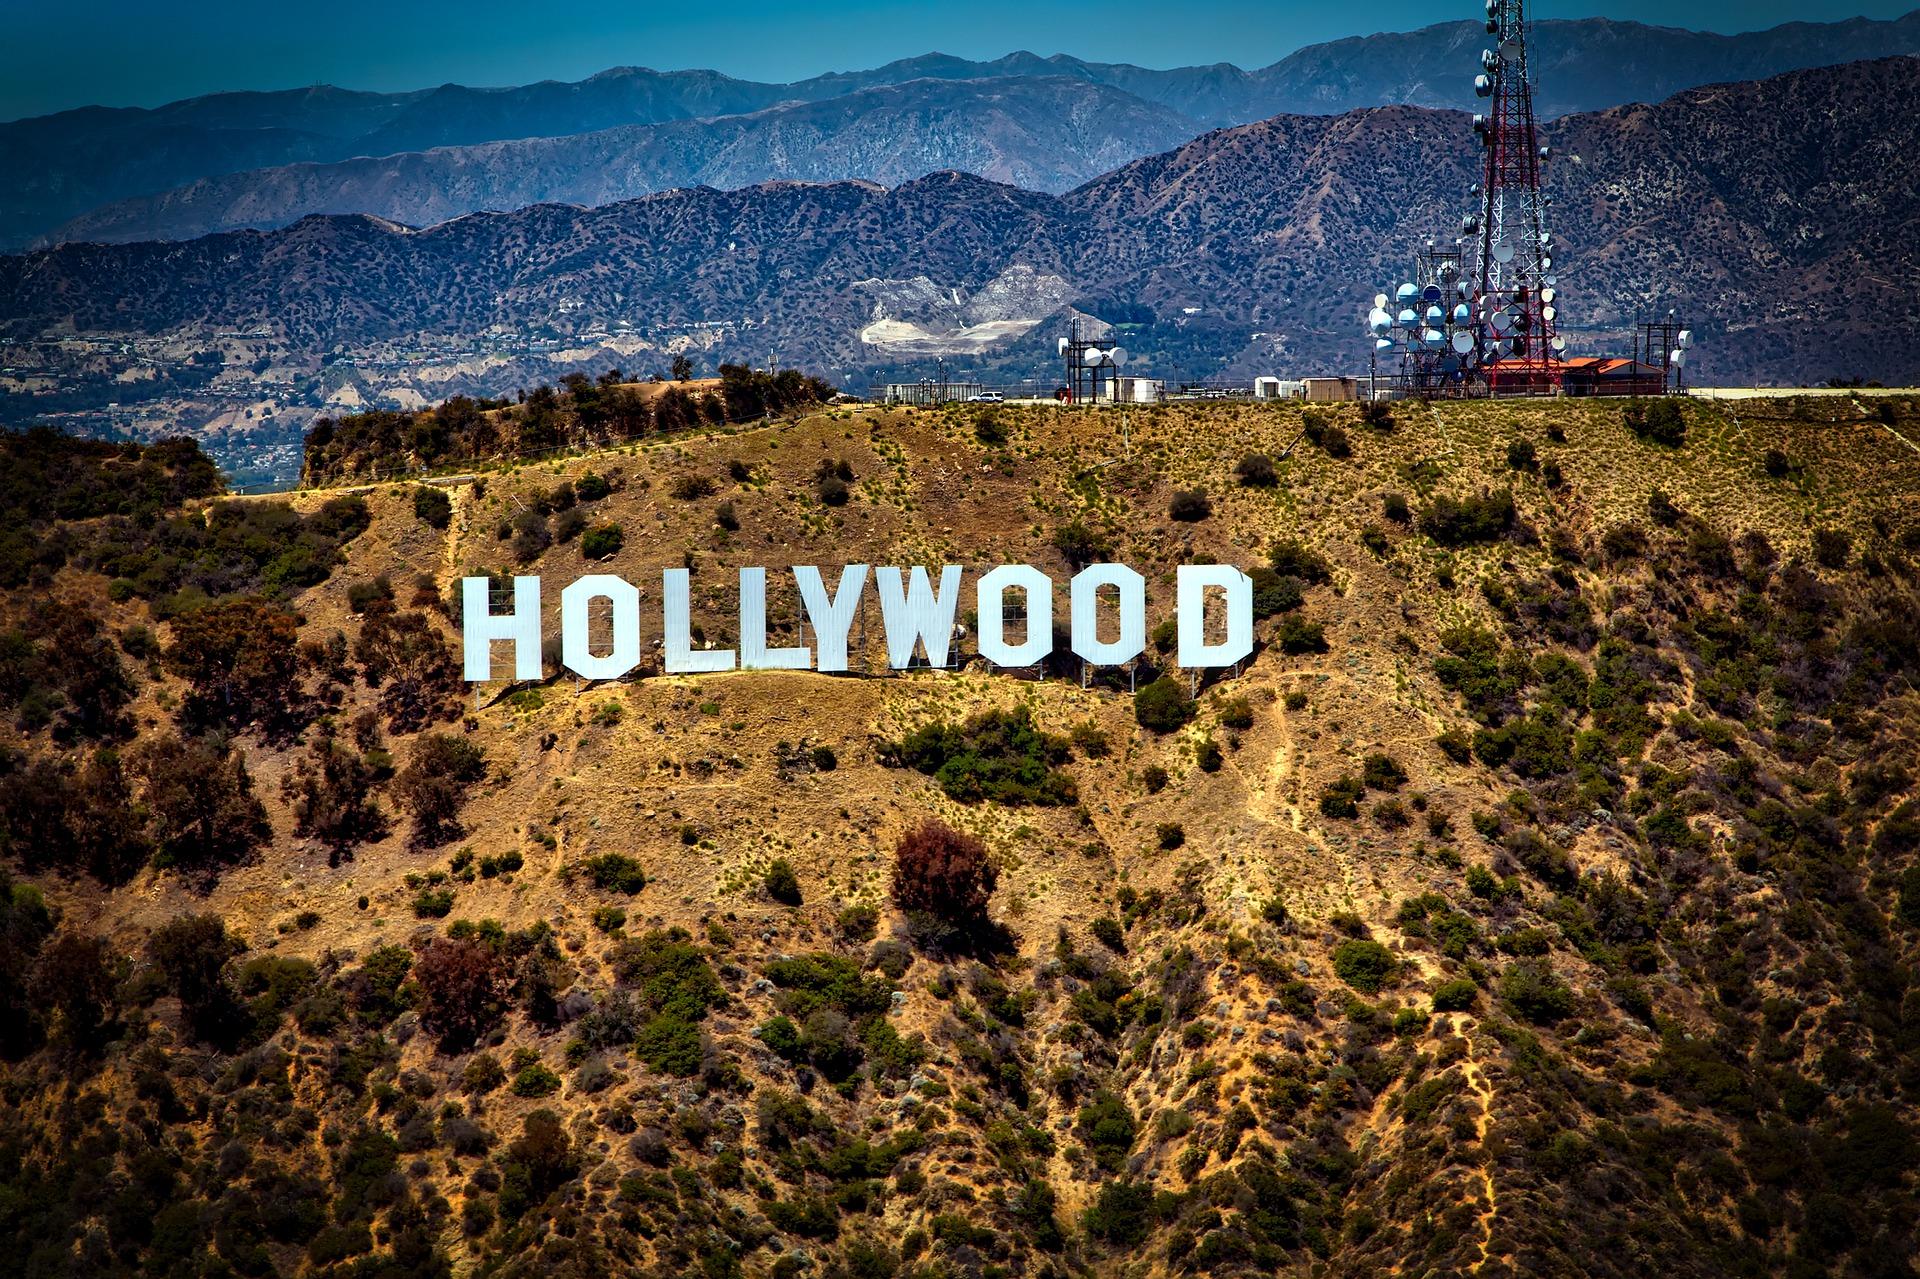 hollywood-sign-los-angeles-california-road-trip-pixabay